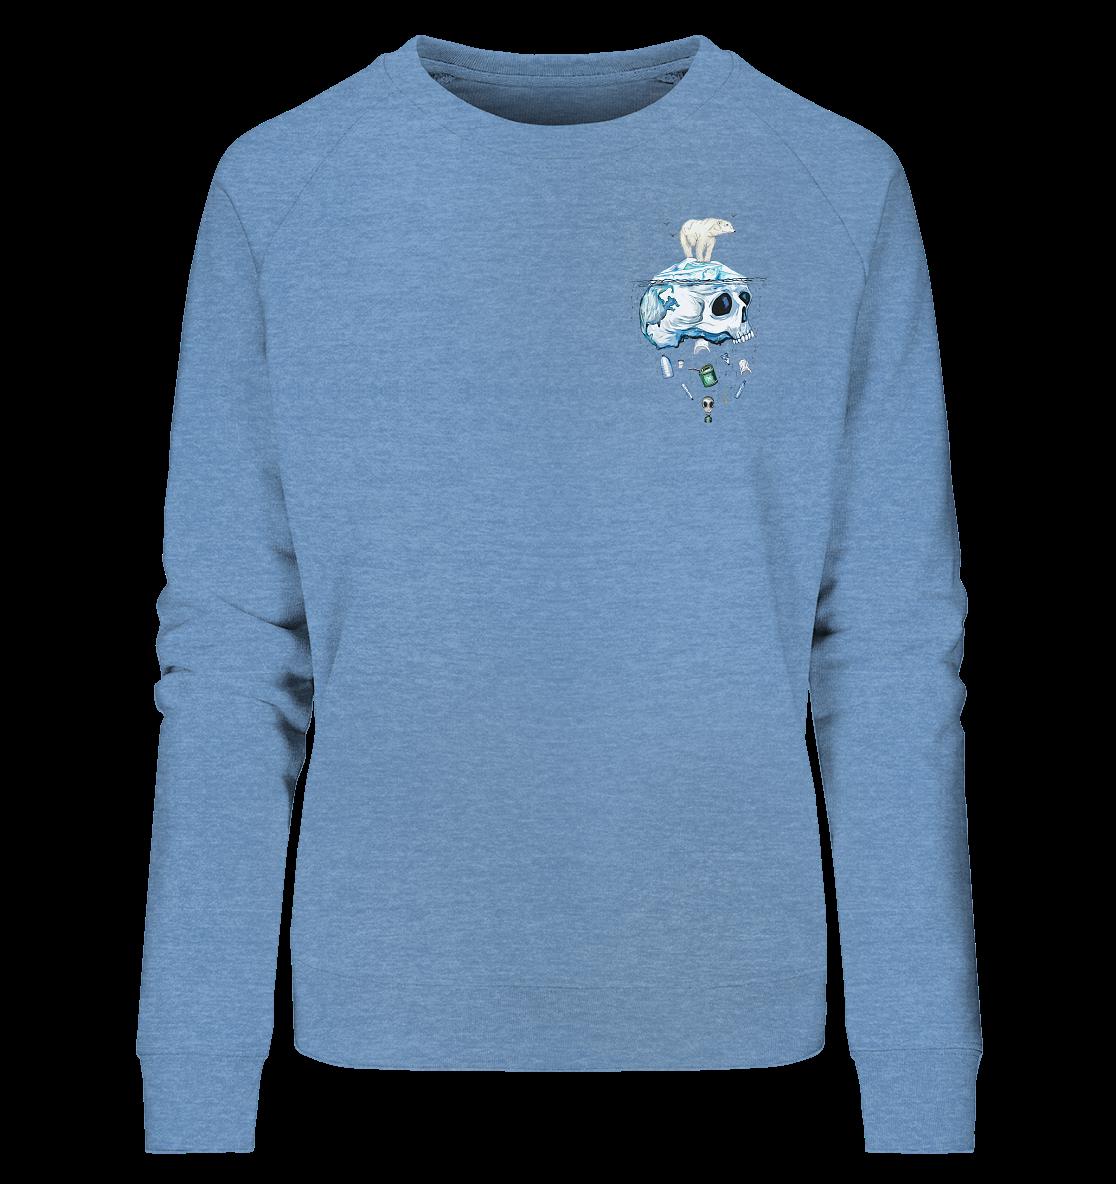 front-ladies-organic-sweatshirt-6090c4-1116x-2.png